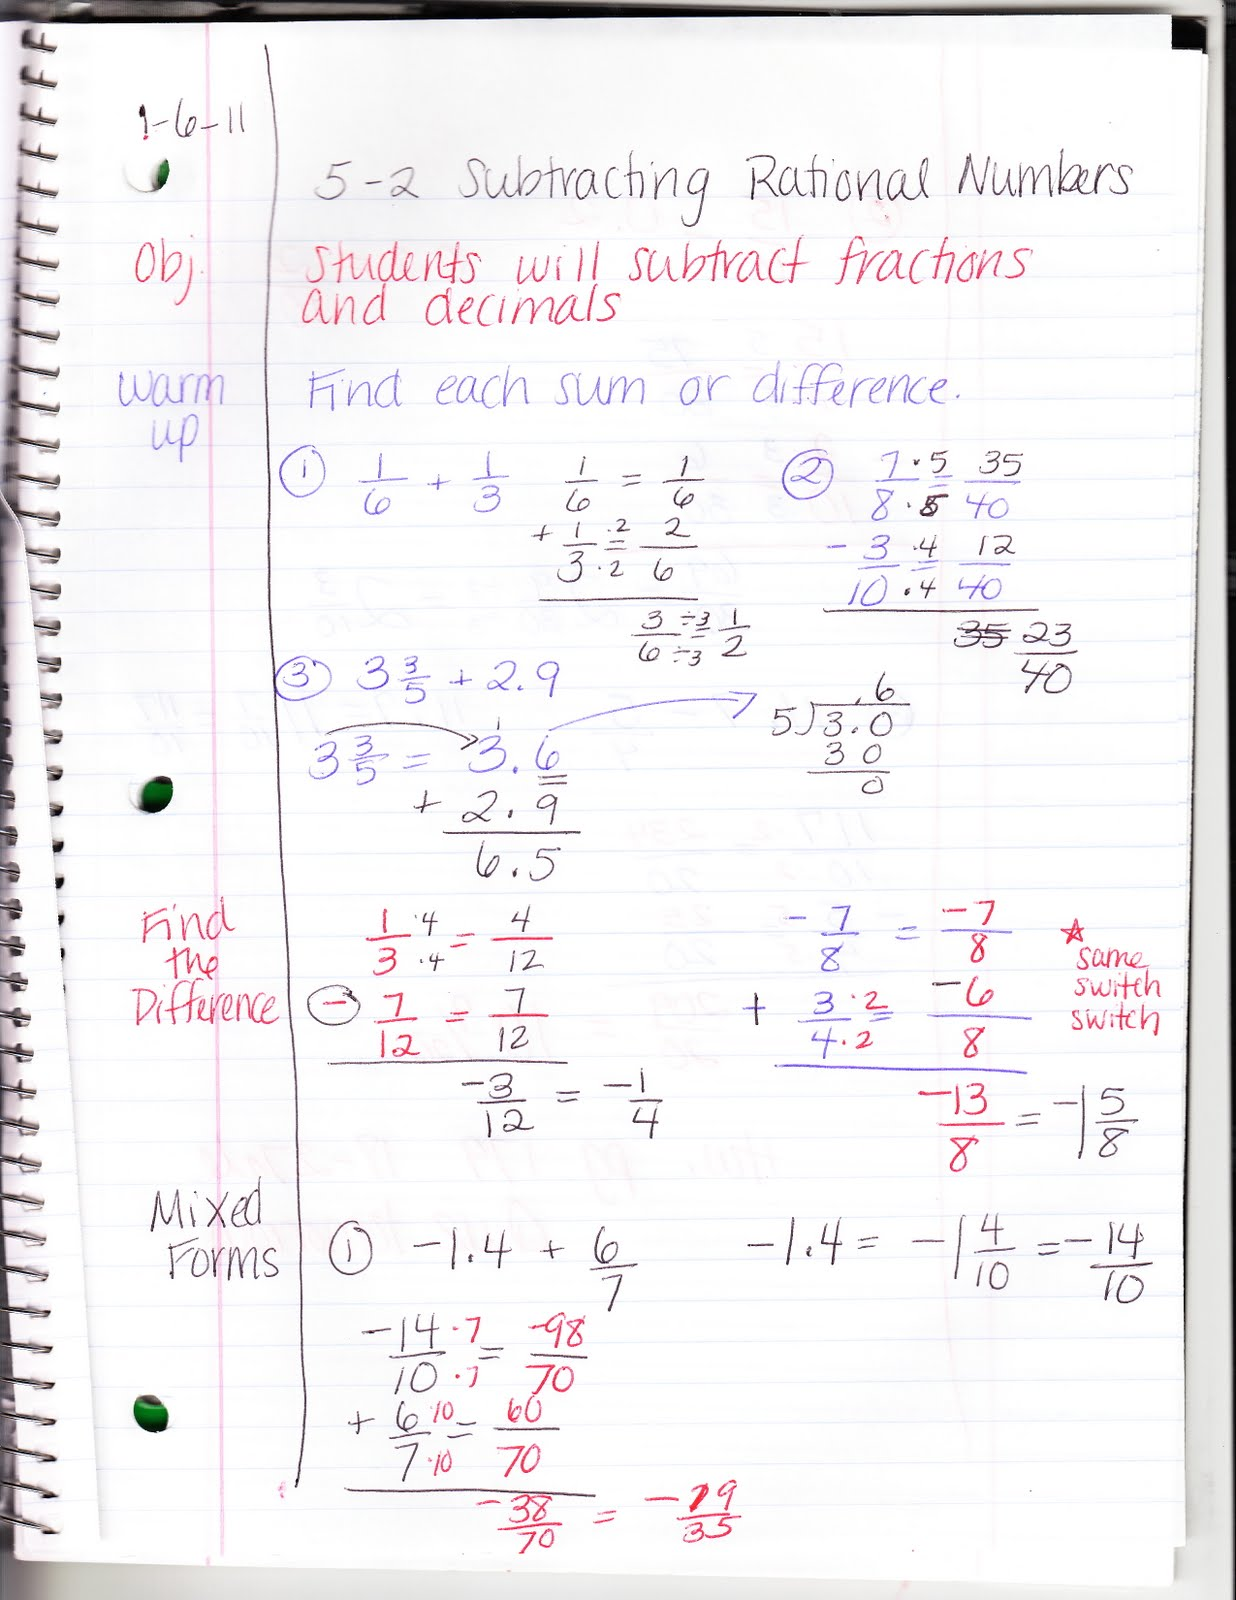 Ms Jean S Algebra Readiness Blog 5 2 Subtracting